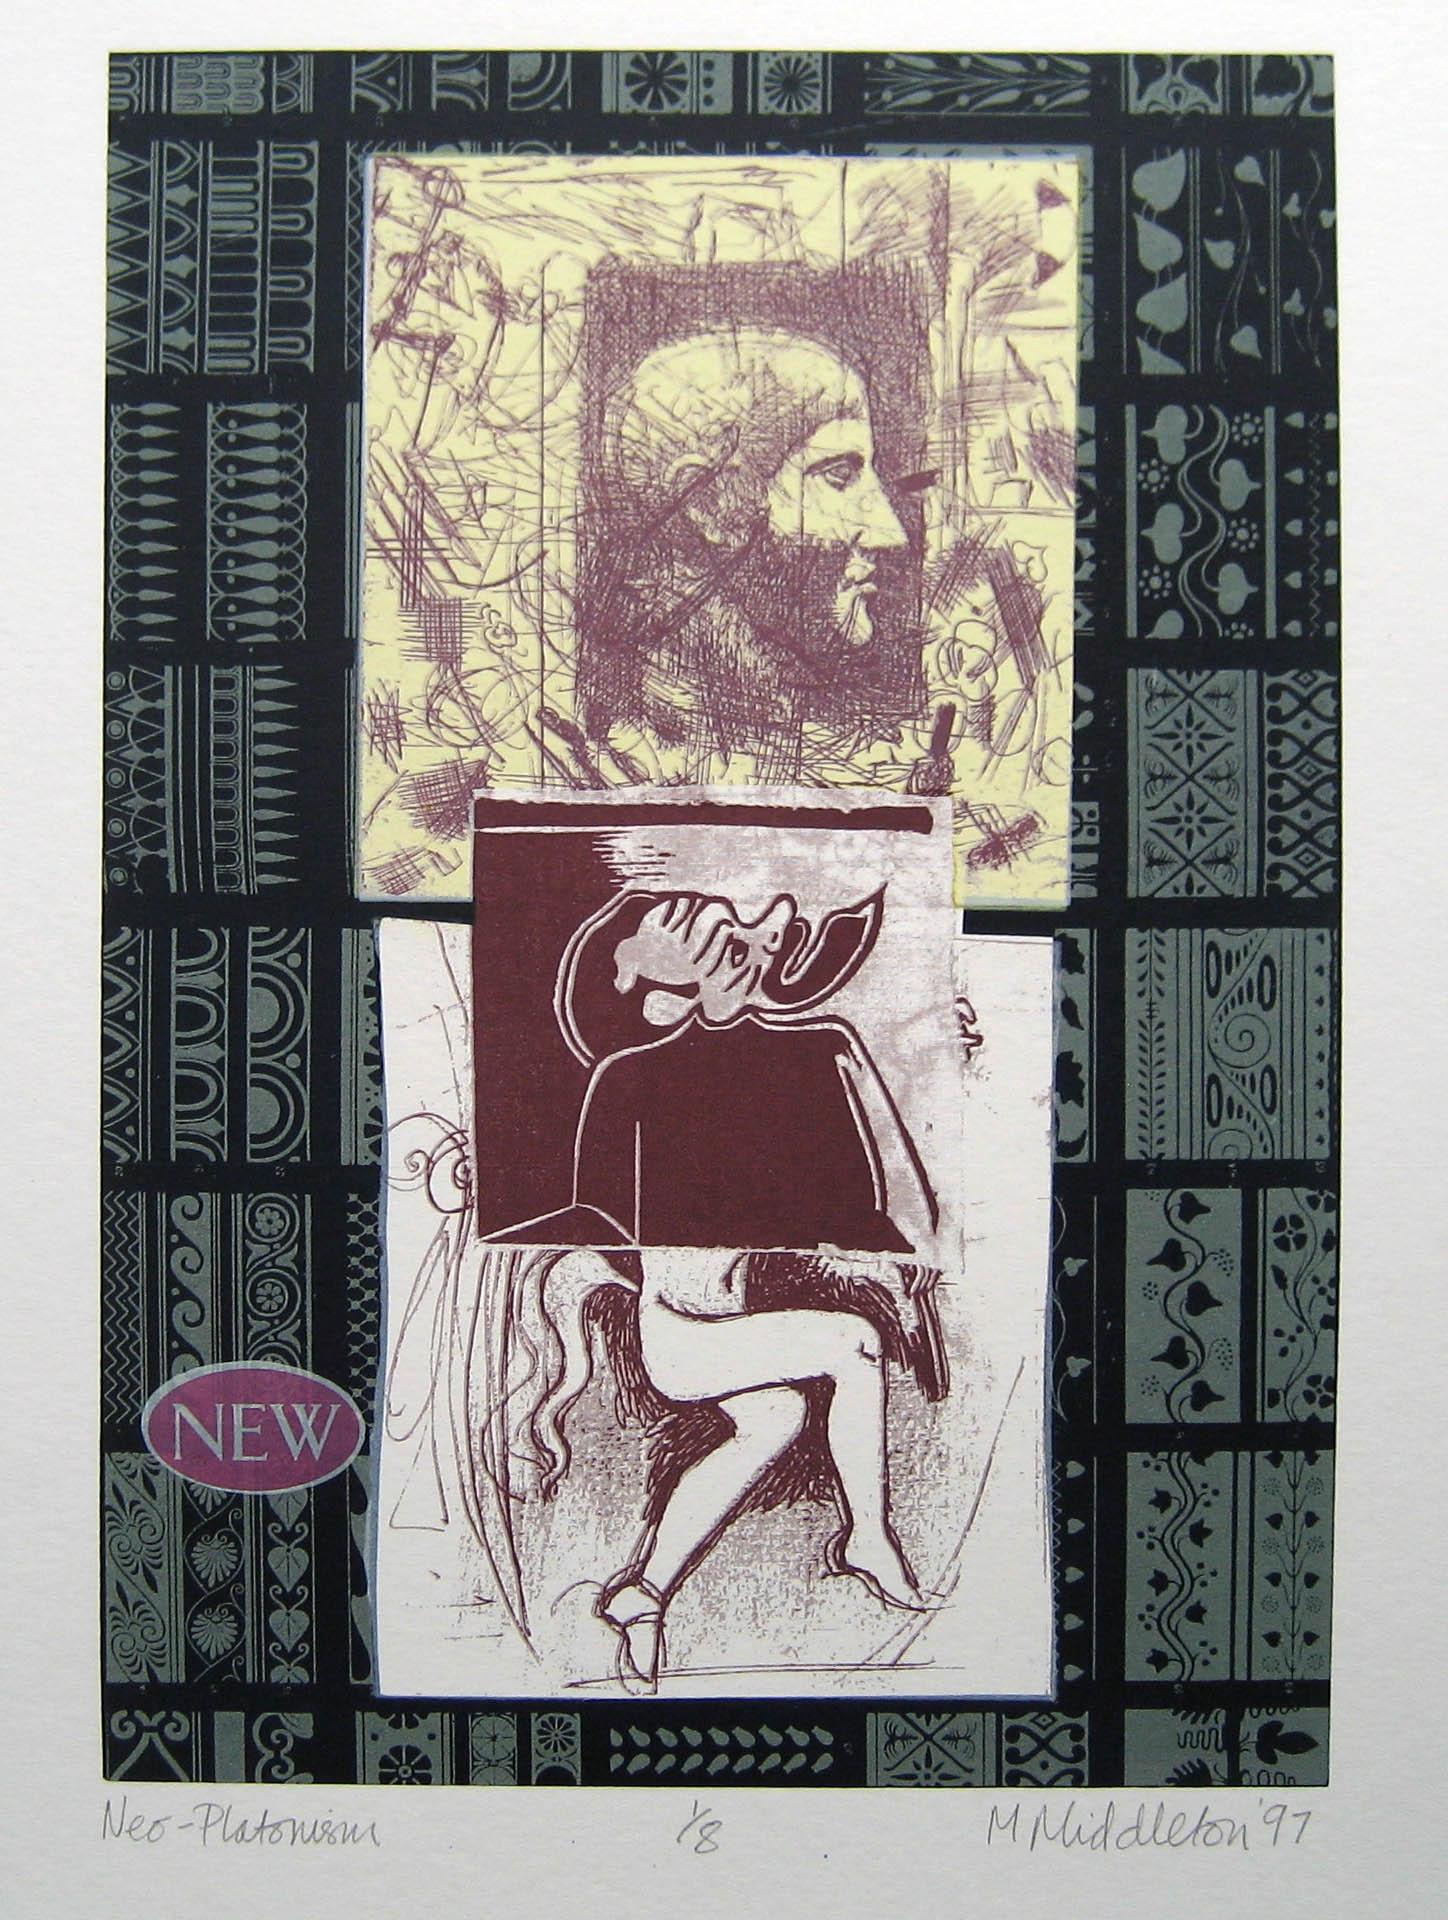 Michael Middleton  Neo-Platonism, Print, 29.5 x 21 cm  [CAS 81]